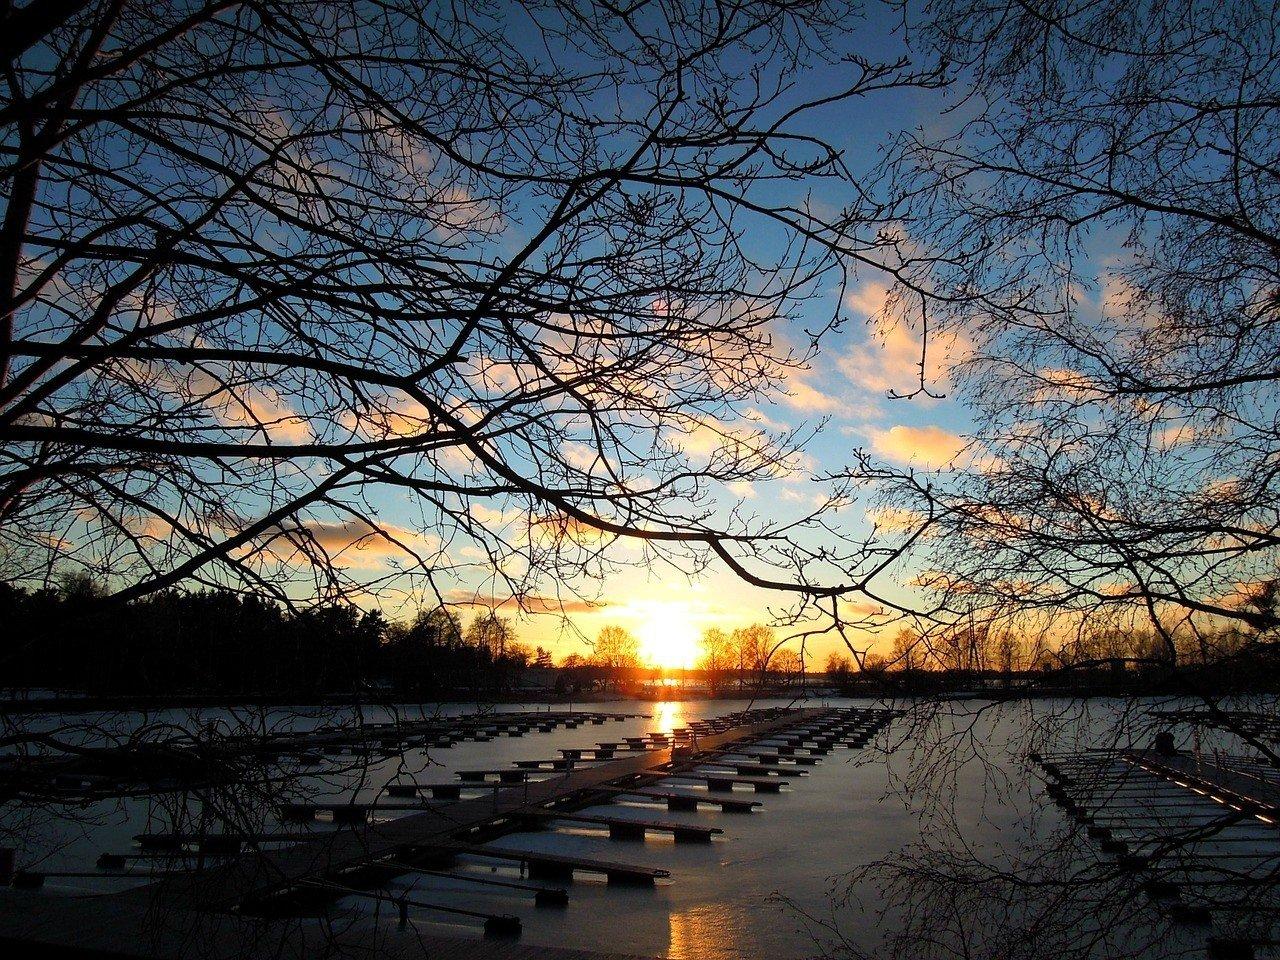 Sunset at Helsinki